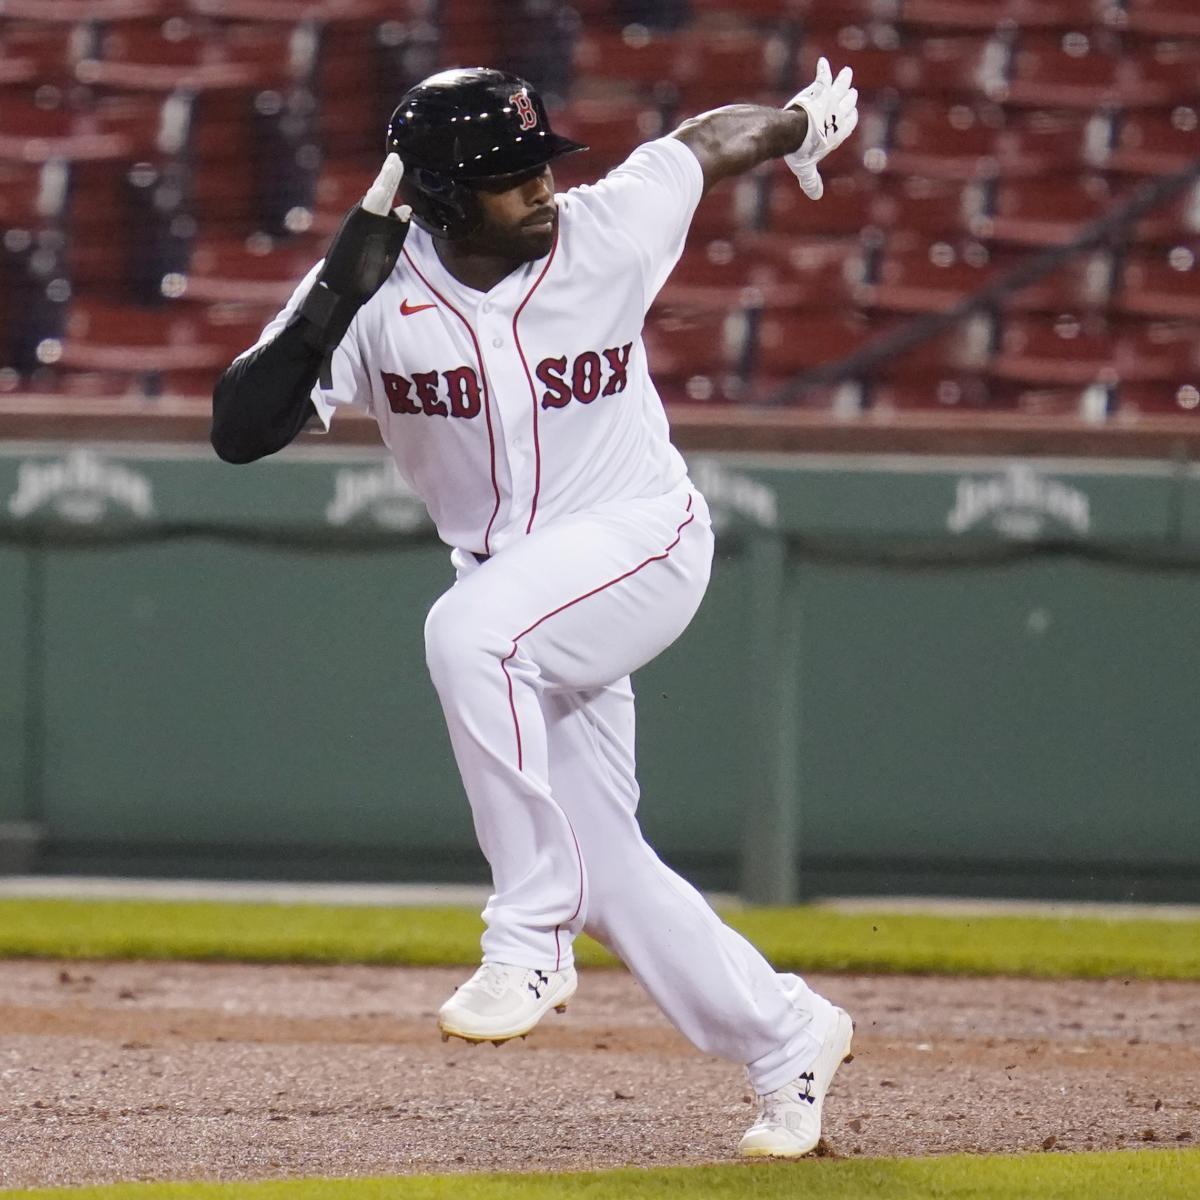 Jackie Bradley Jr. Rumors: Brewers Pursuing Free Agent Amid Red Sox, Mets Links